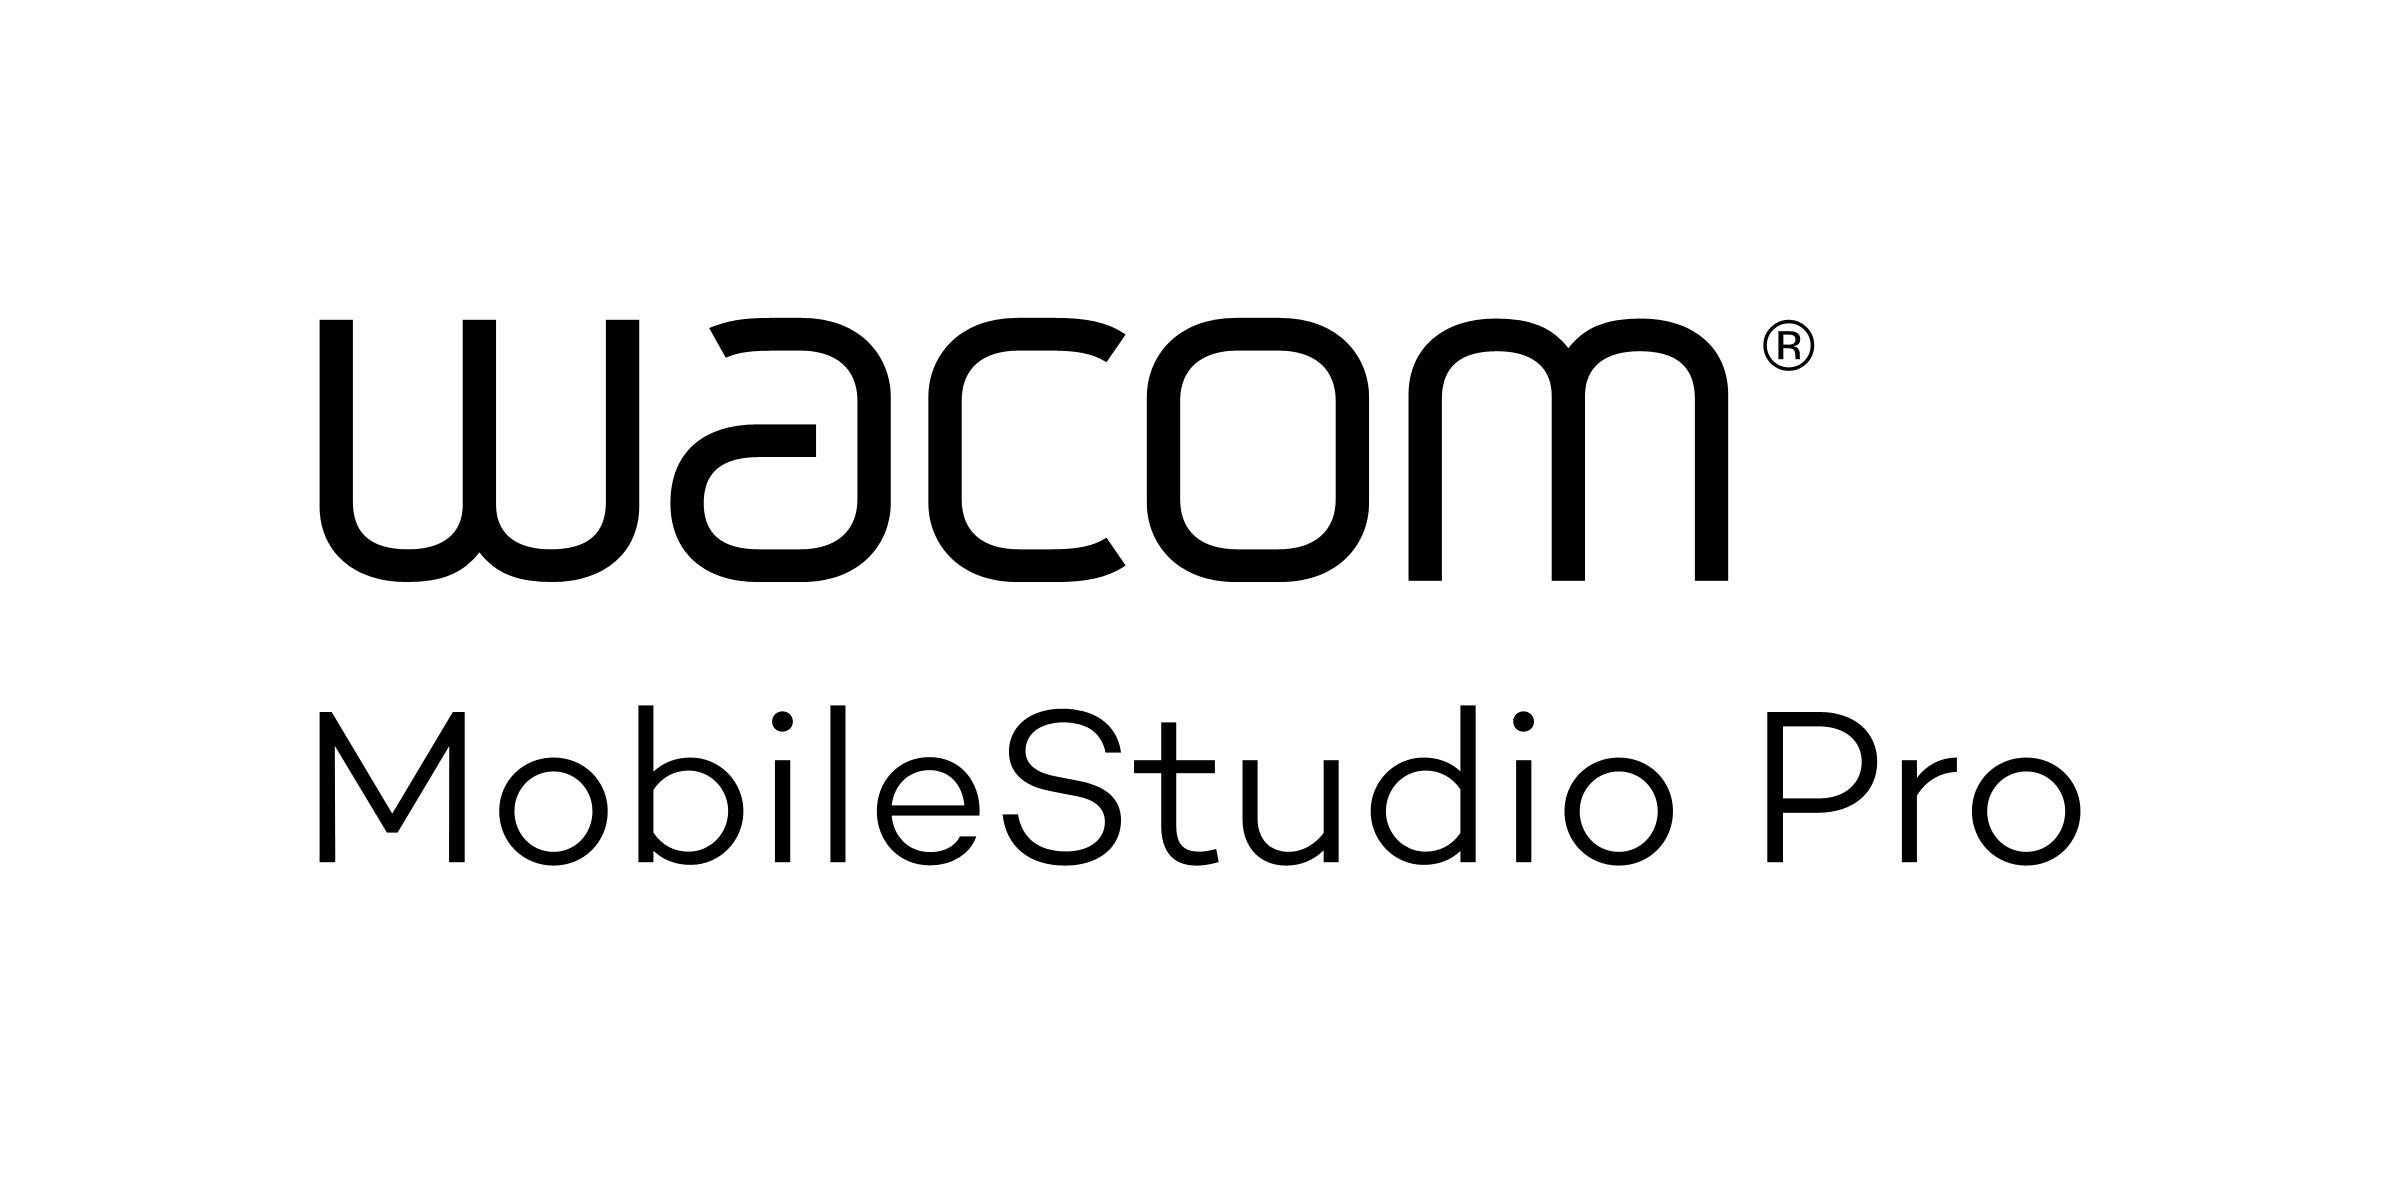 Carbon Computing / Wacom: Mobile Studio Pro / Cintiq / Intuos